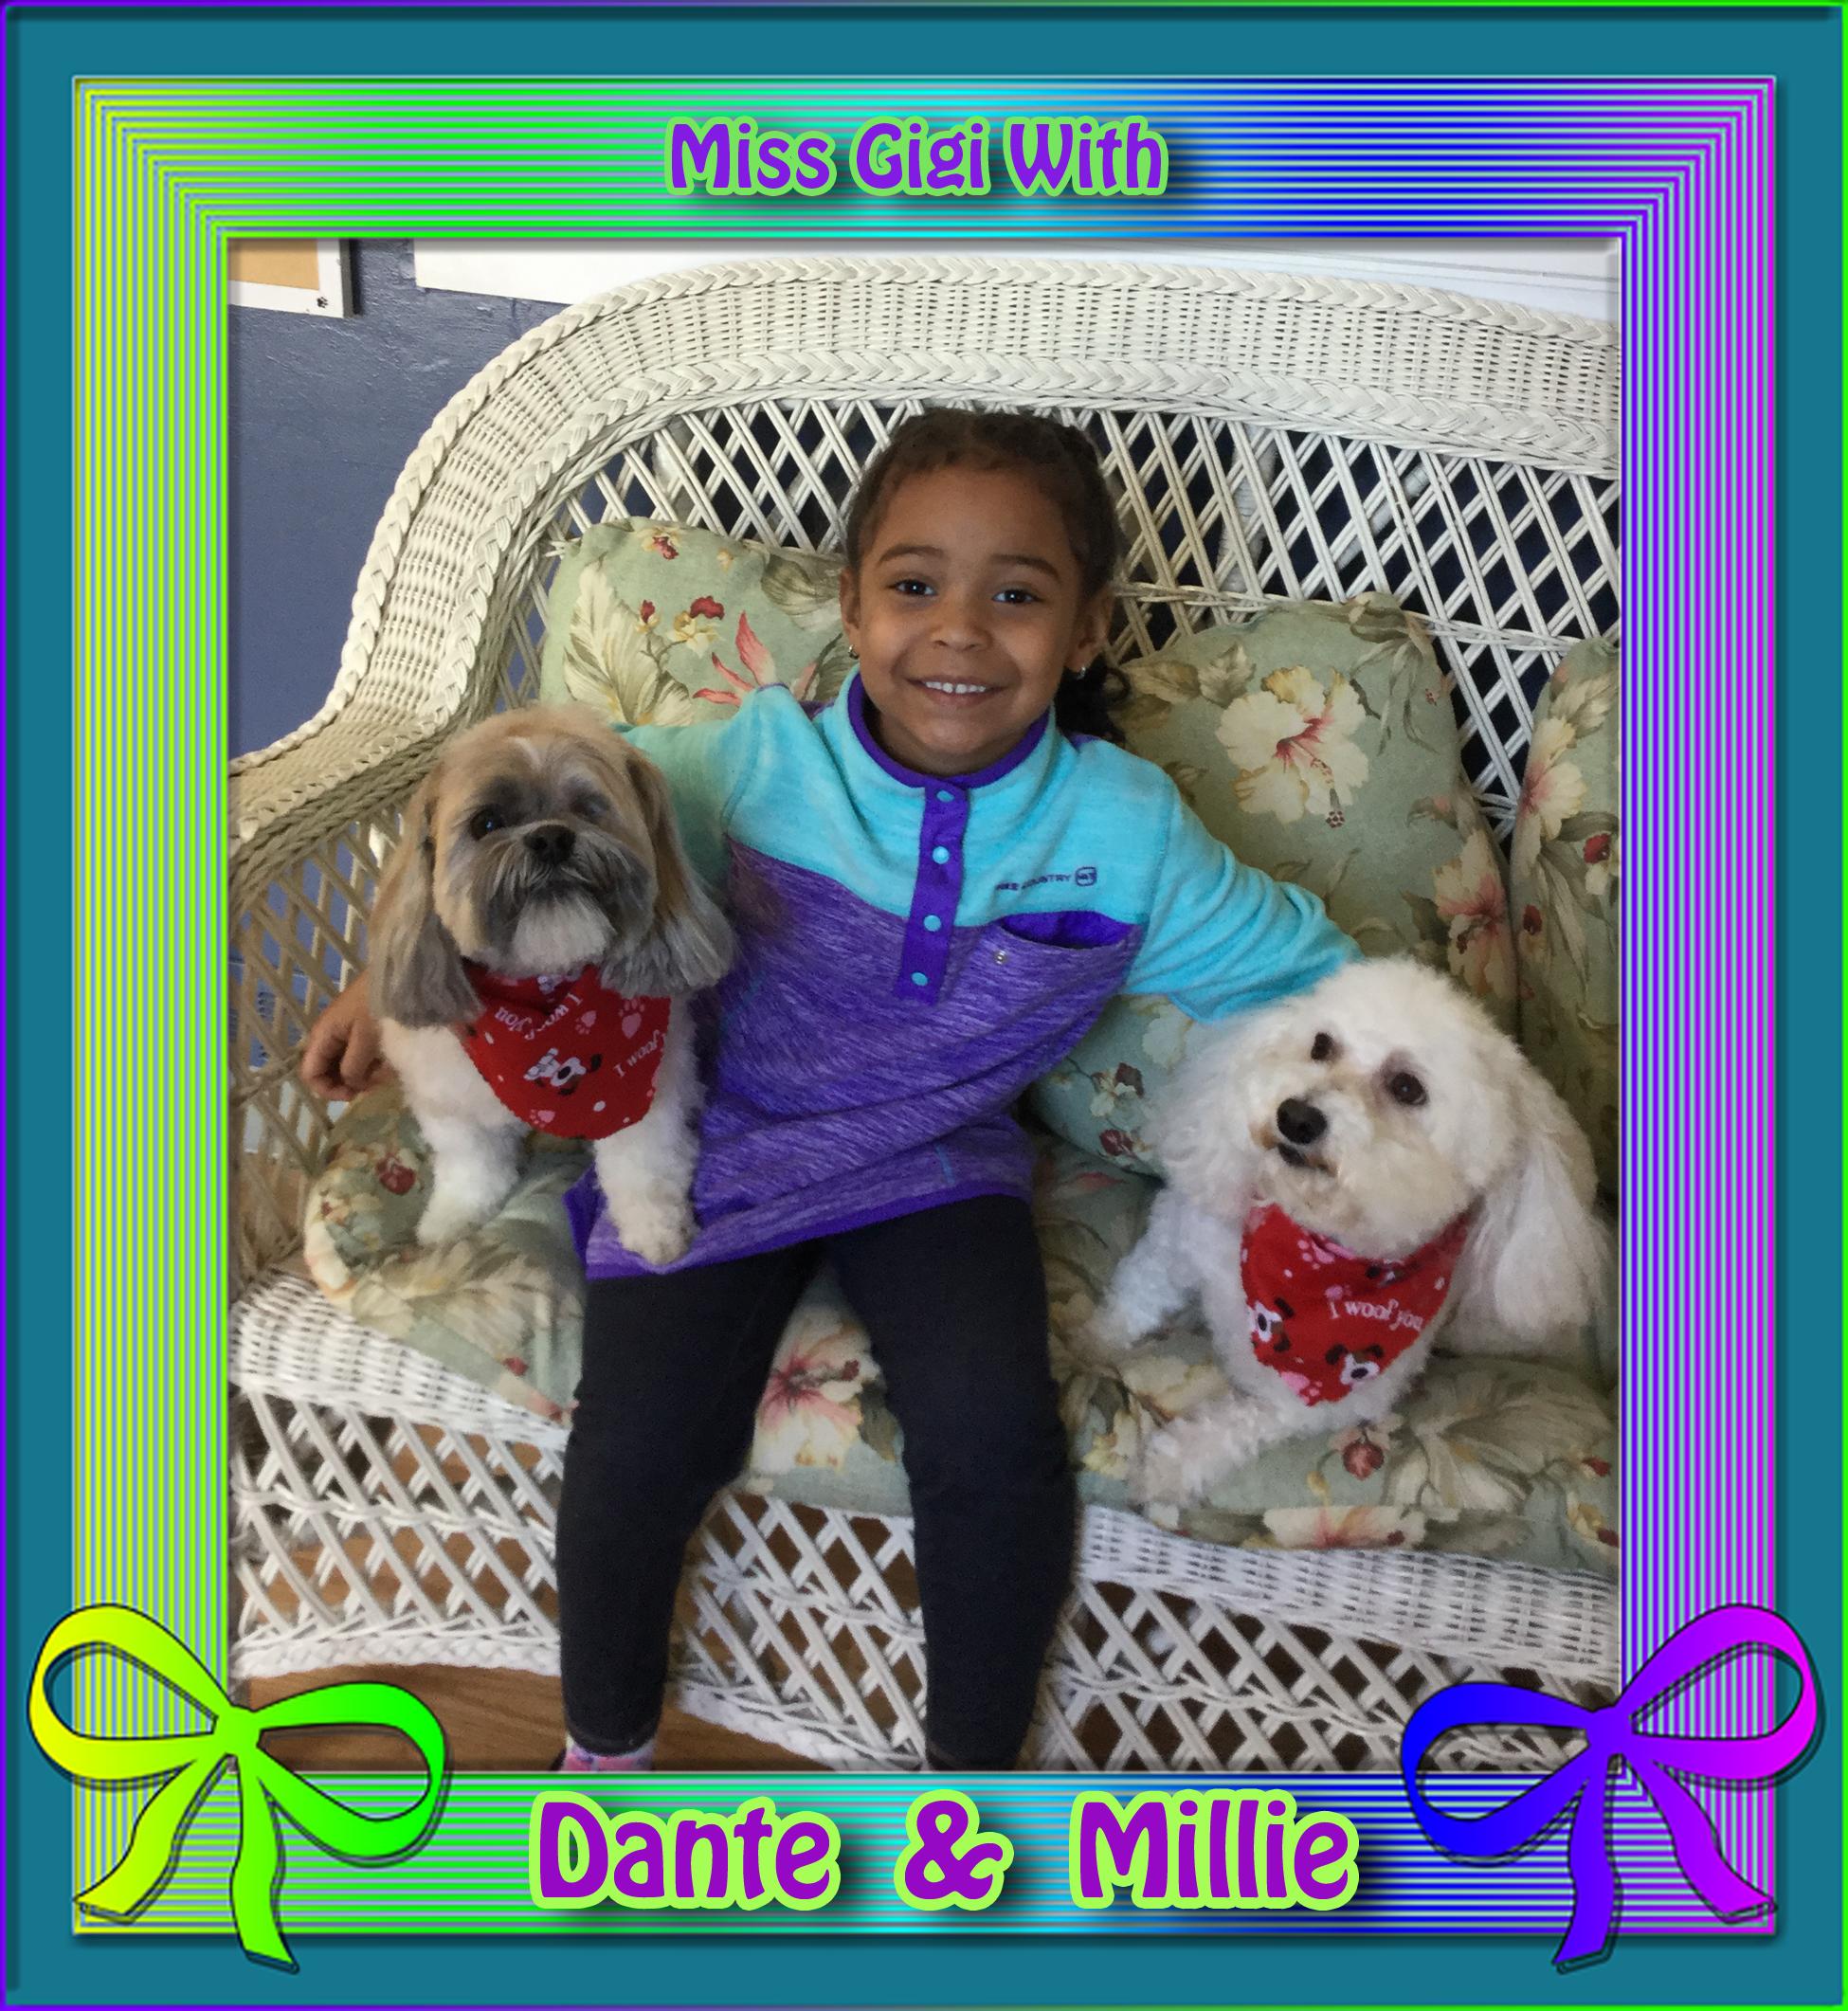 Dante & Millie